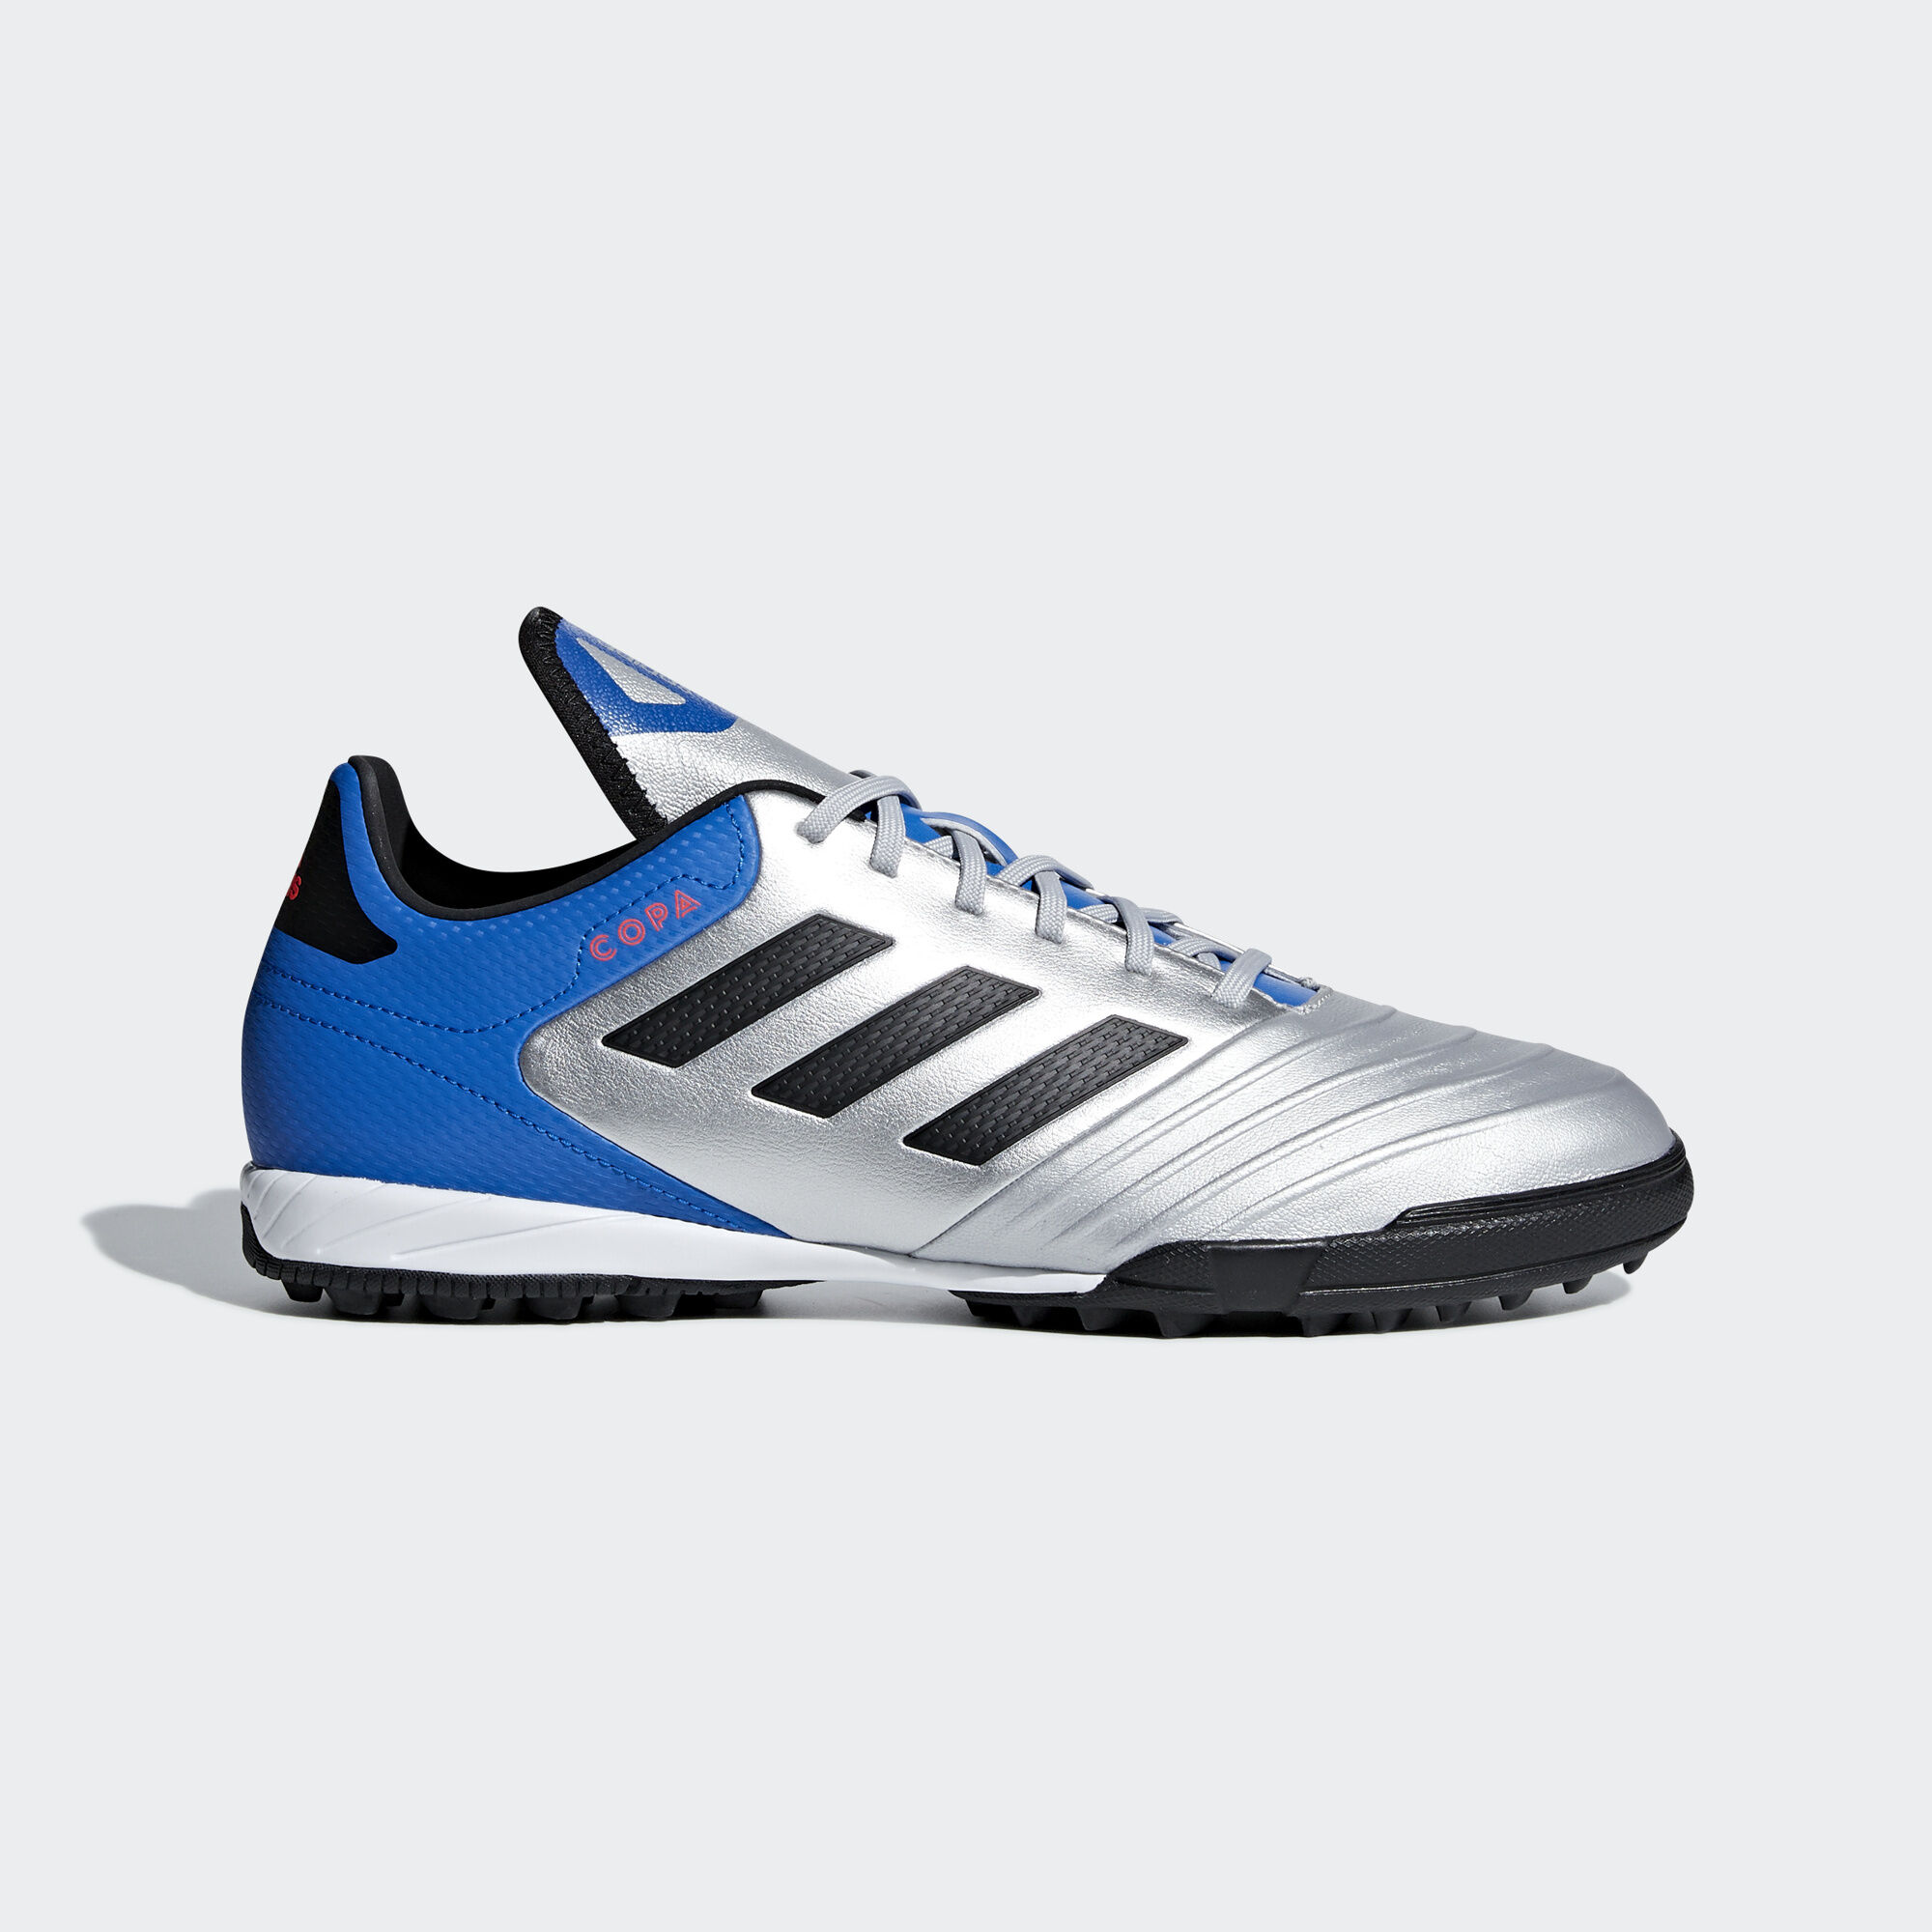 sale retailer 9a647 b3680 adidas - Copa Tango 18.3 Turf Boots Silver Met.  Core Black  Football  Blue. Men Football